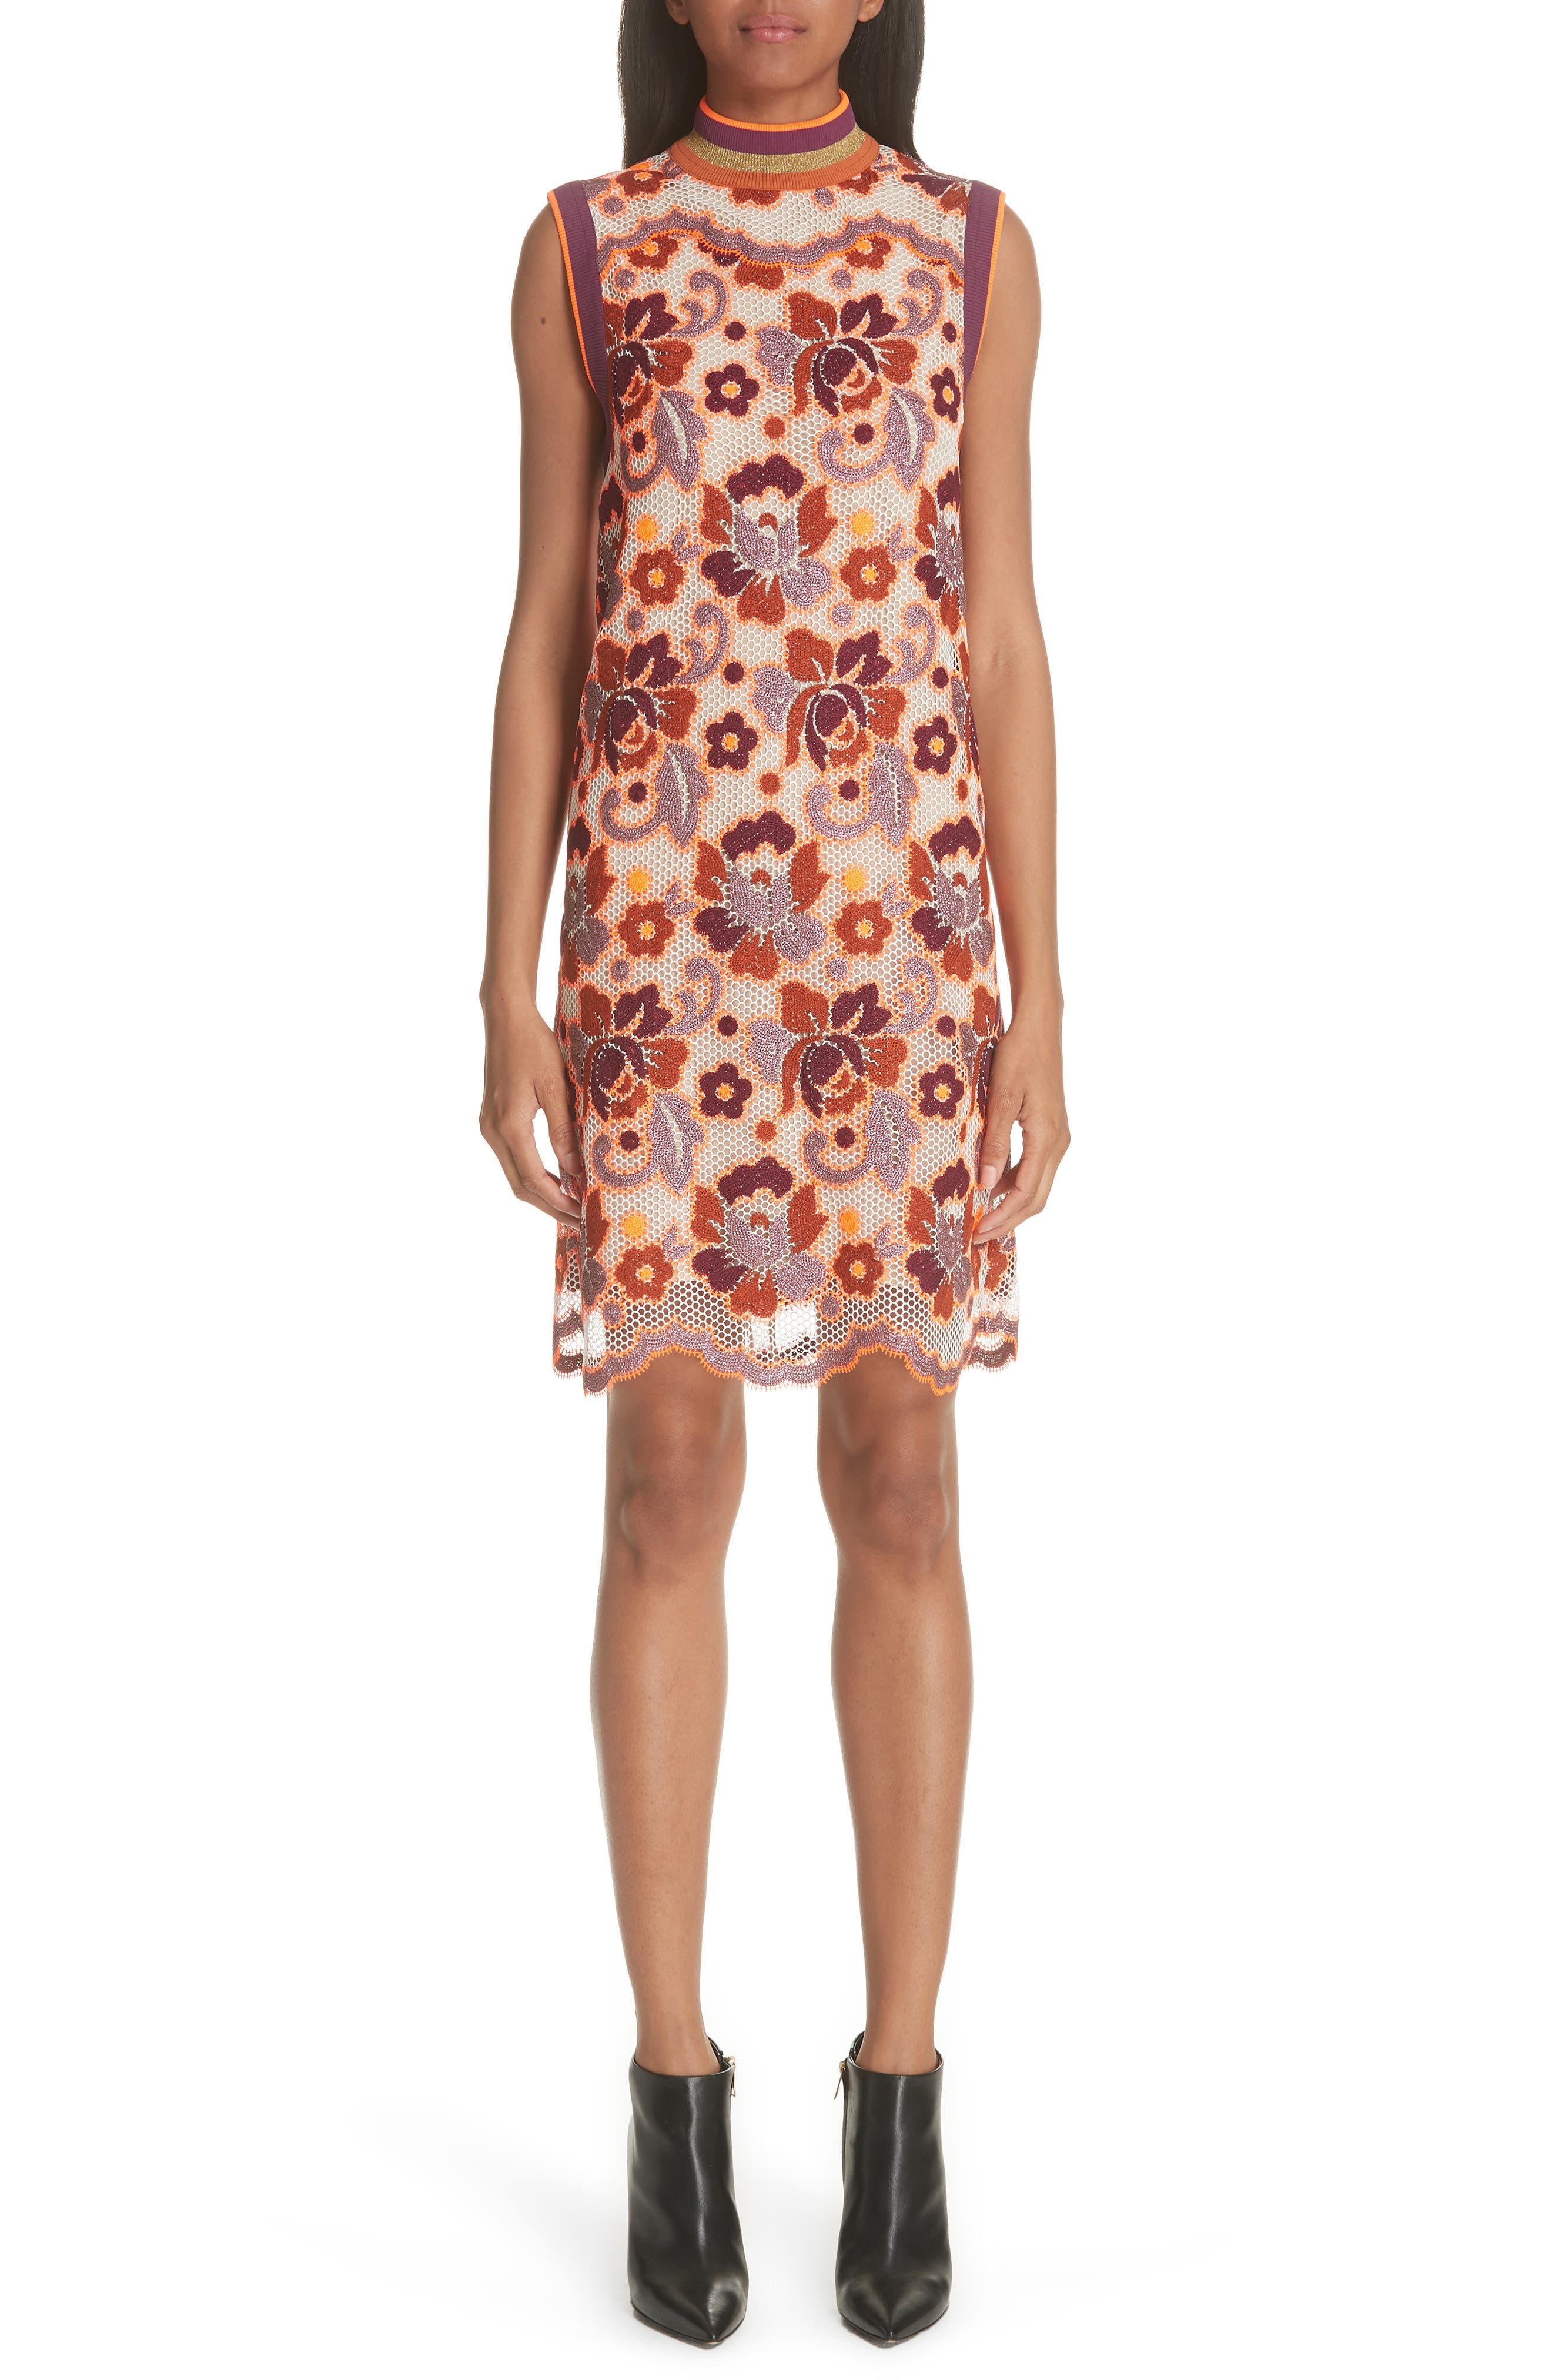 Burberry Edna Floral Crochet Shift Dress